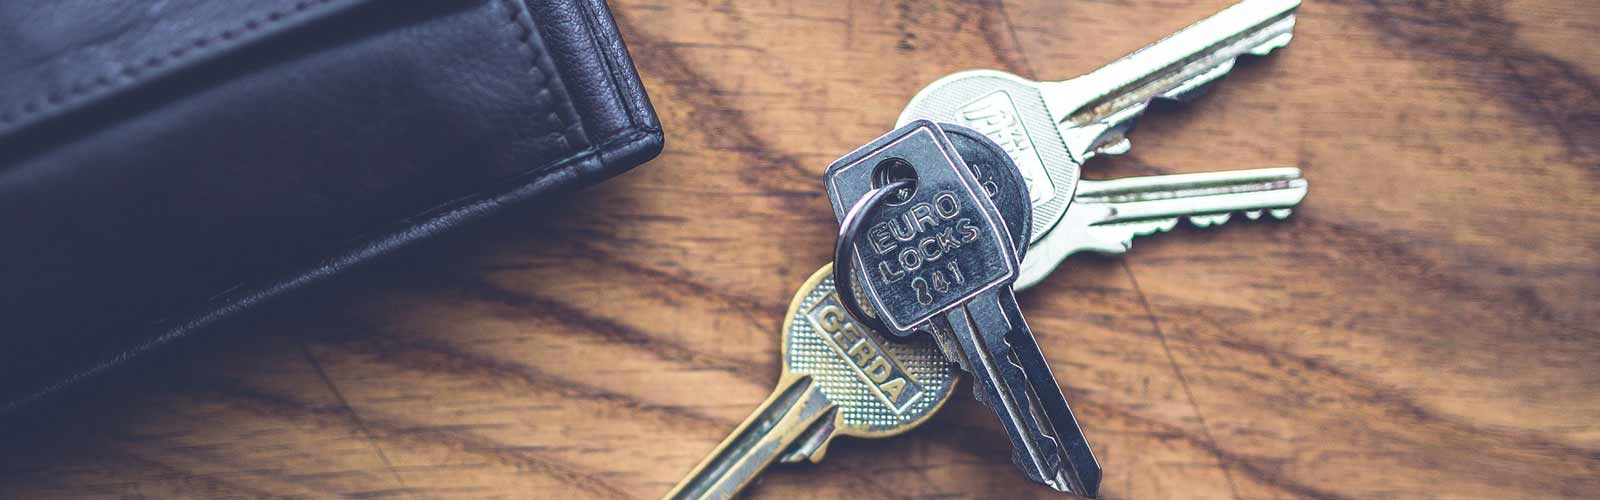 locksmith-cornwall-keys